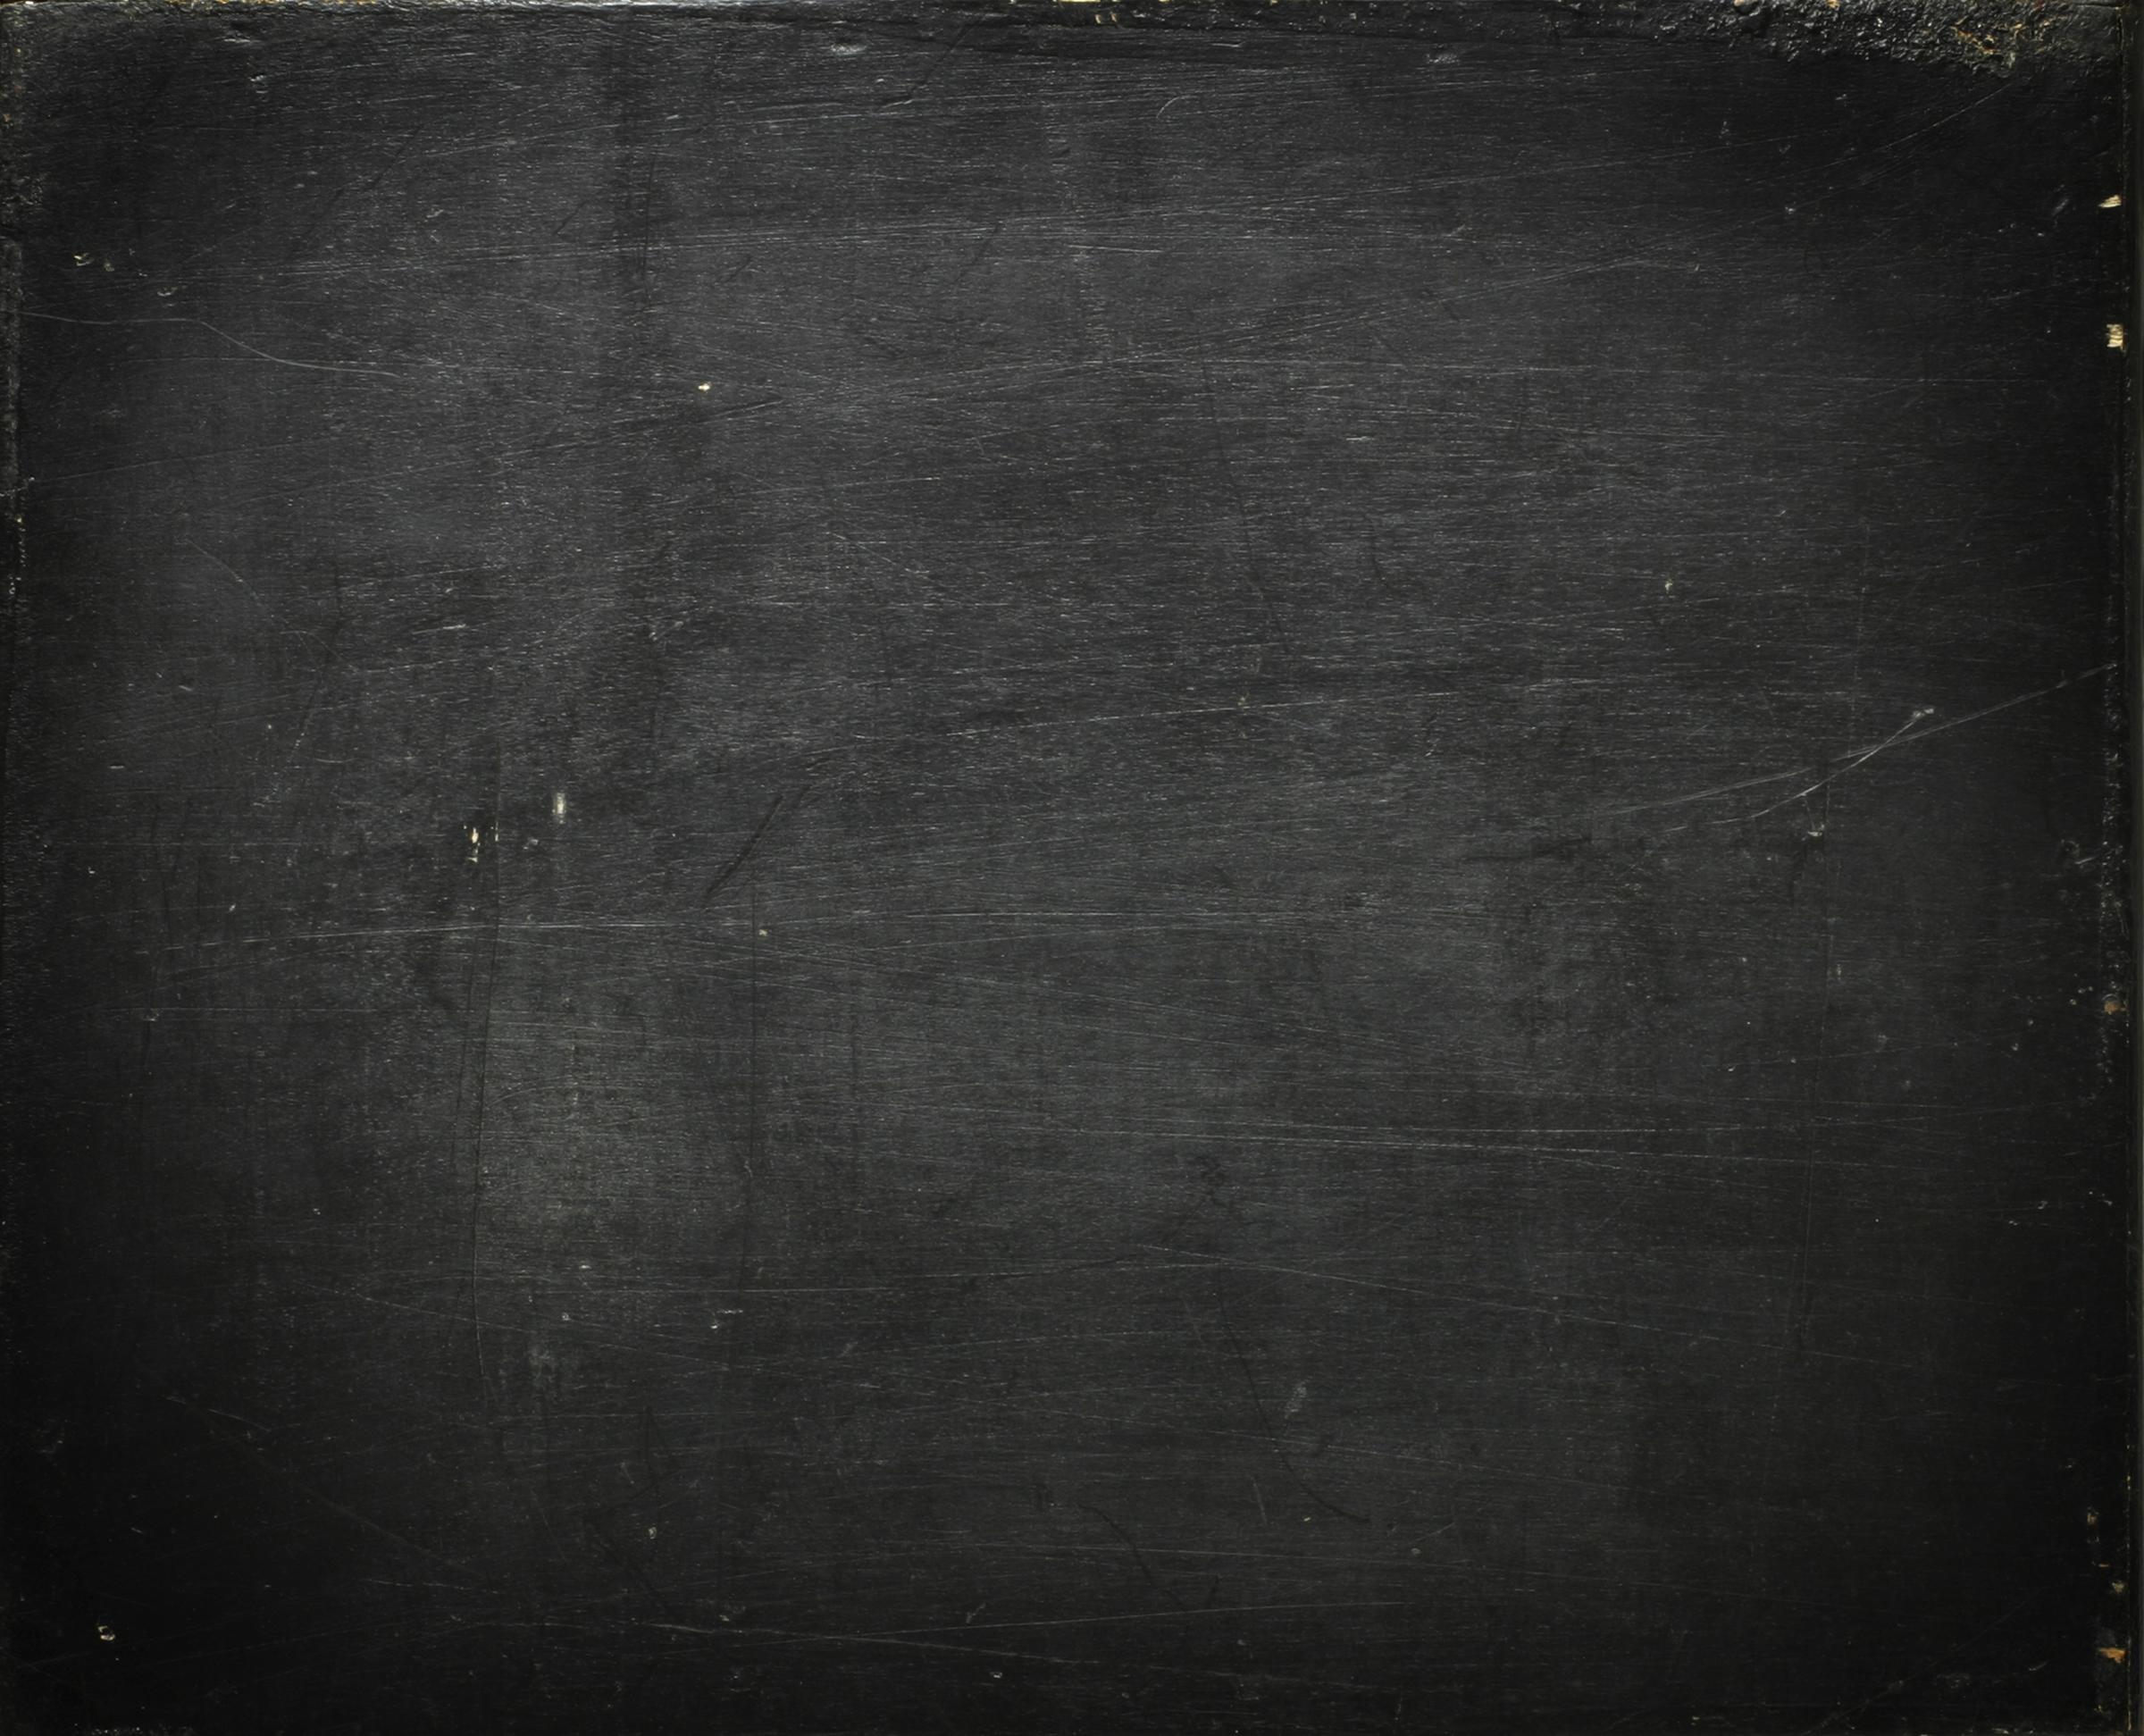 Black chalk board background clipart graphic black and white download Free Chalk Board, Download Free Clip Art, Free Clip Art on Clipart ... graphic black and white download